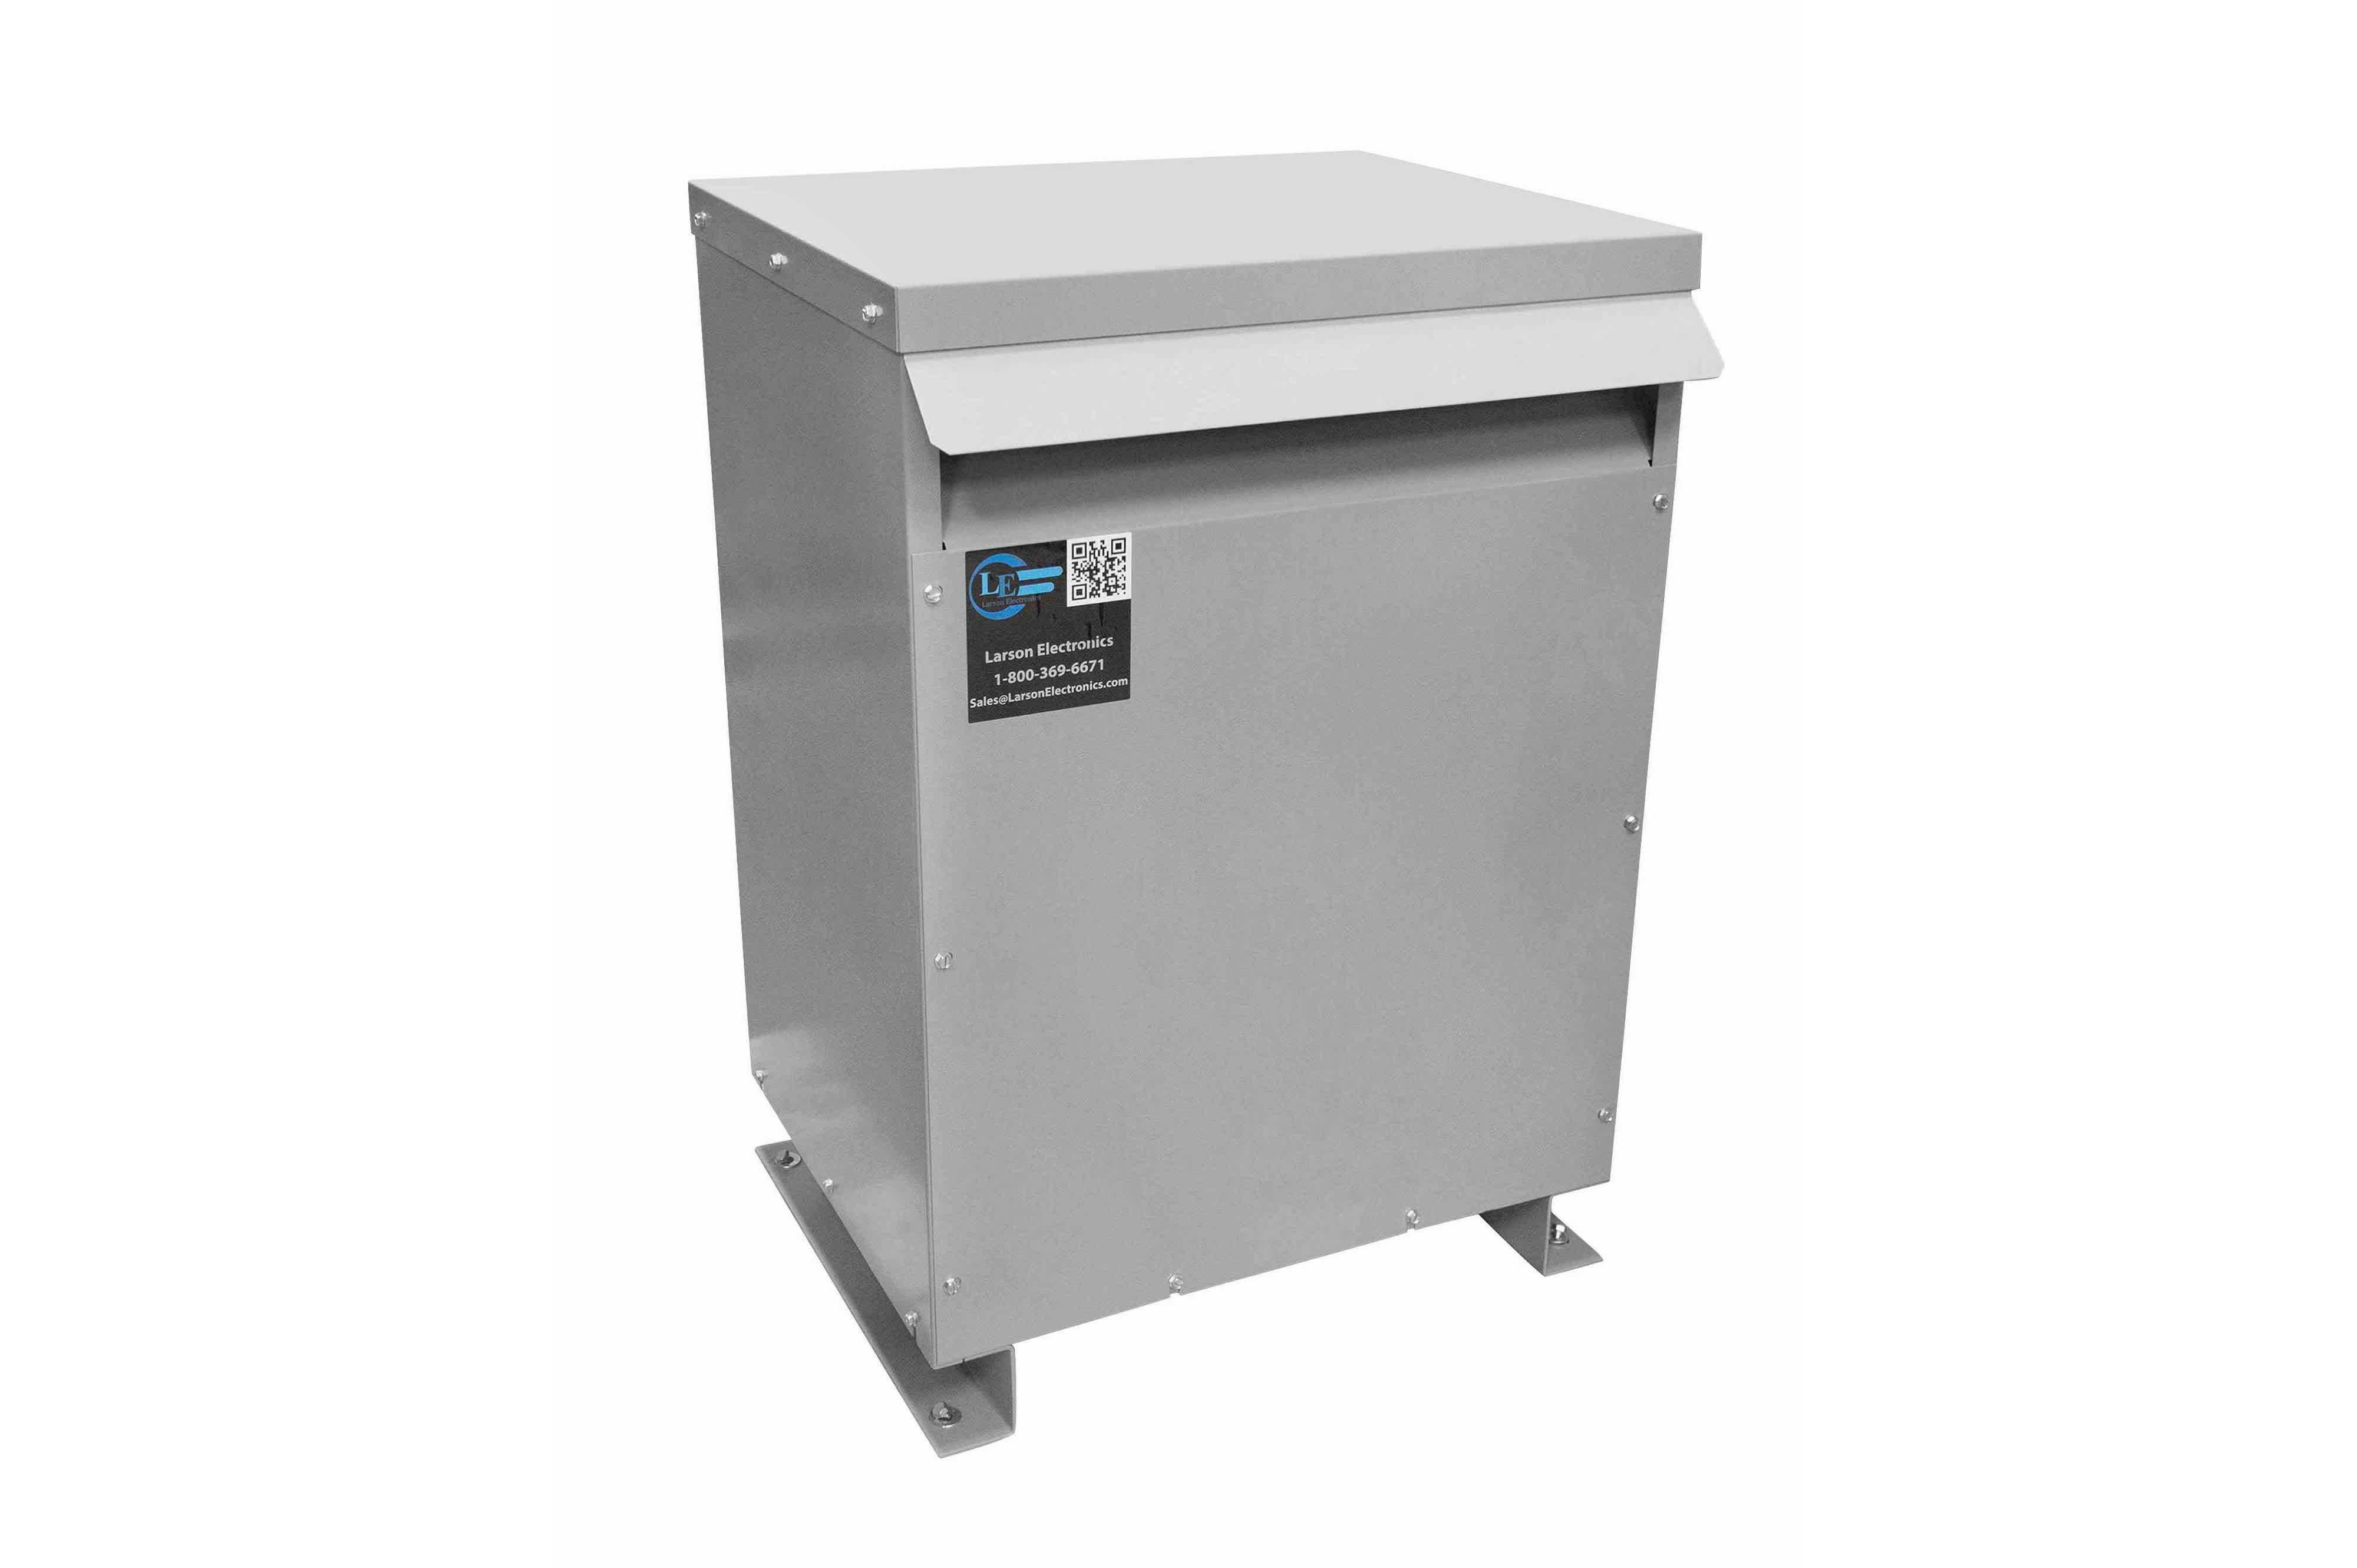 500 kVA 3PH Isolation Transformer, 240V Wye Primary, 400V Delta Secondary, N3R, Ventilated, 60 Hz